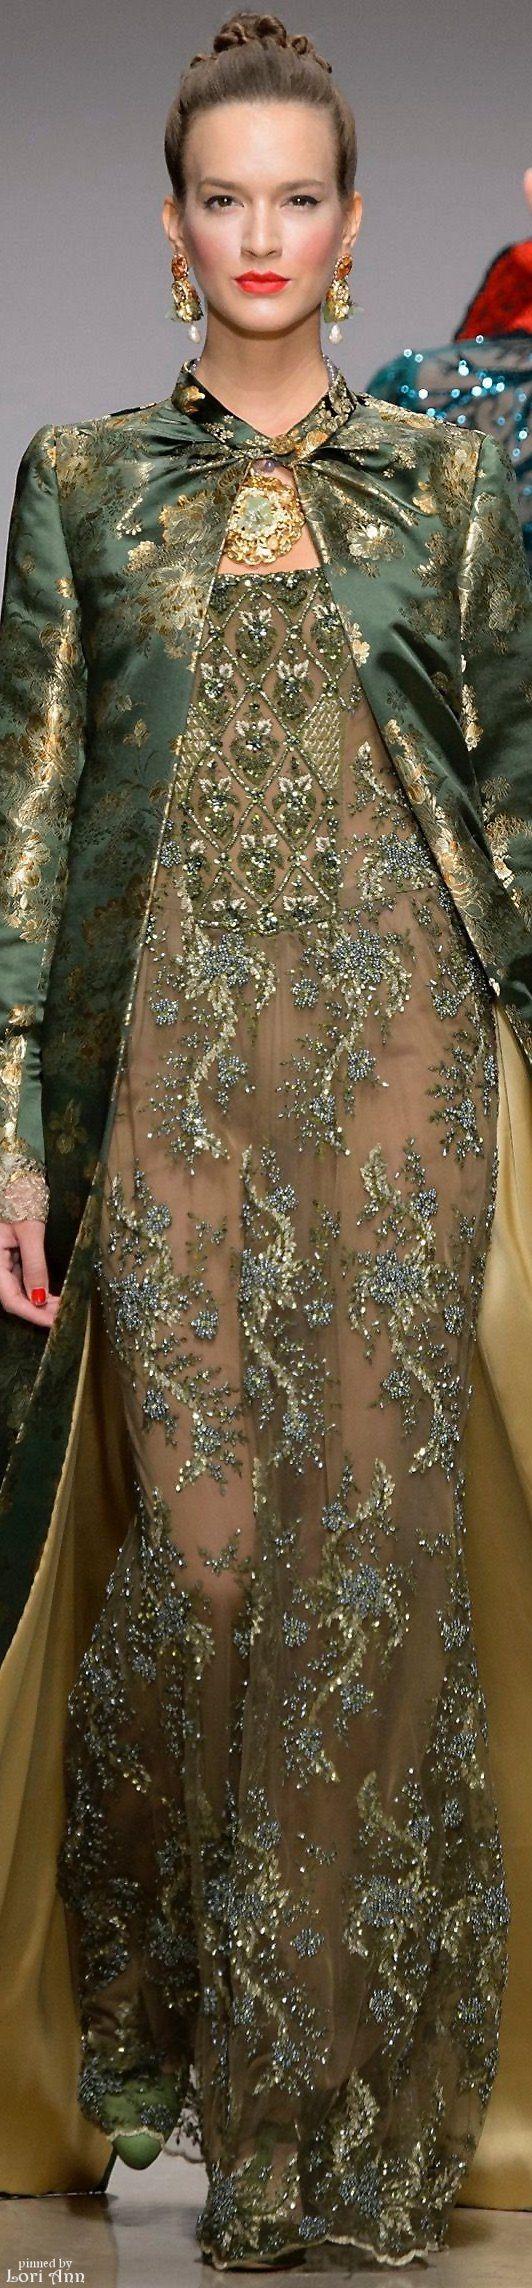 Raffaella Curiel Couture Fall 2015 ~#gorgeousgreen